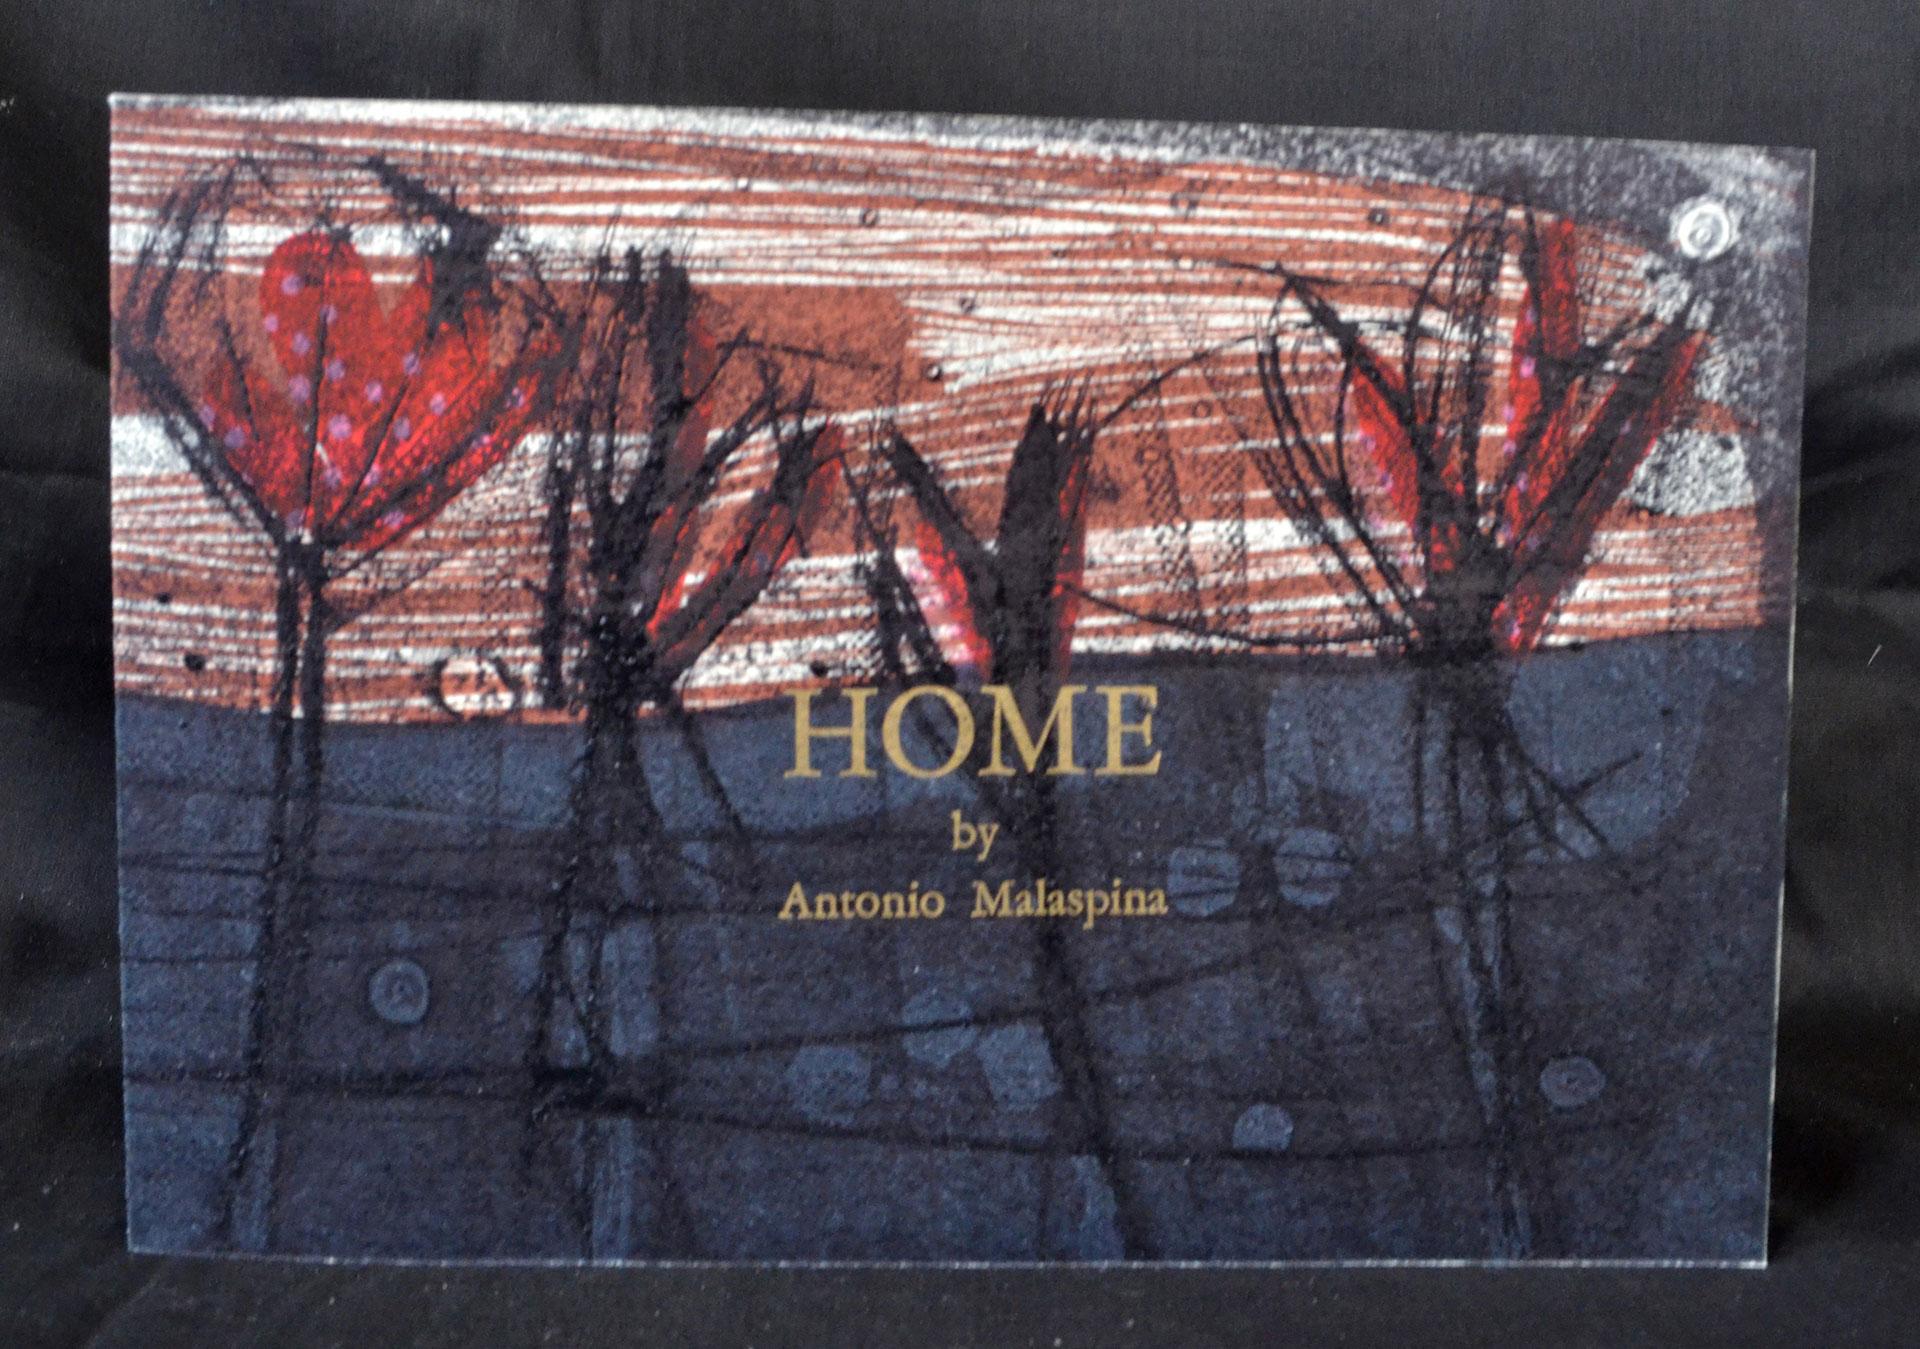 Antonio Malaspina, Home, Letterpress, Screenprint, Woodcut, Engraving, 2016, $250, Larino, IT